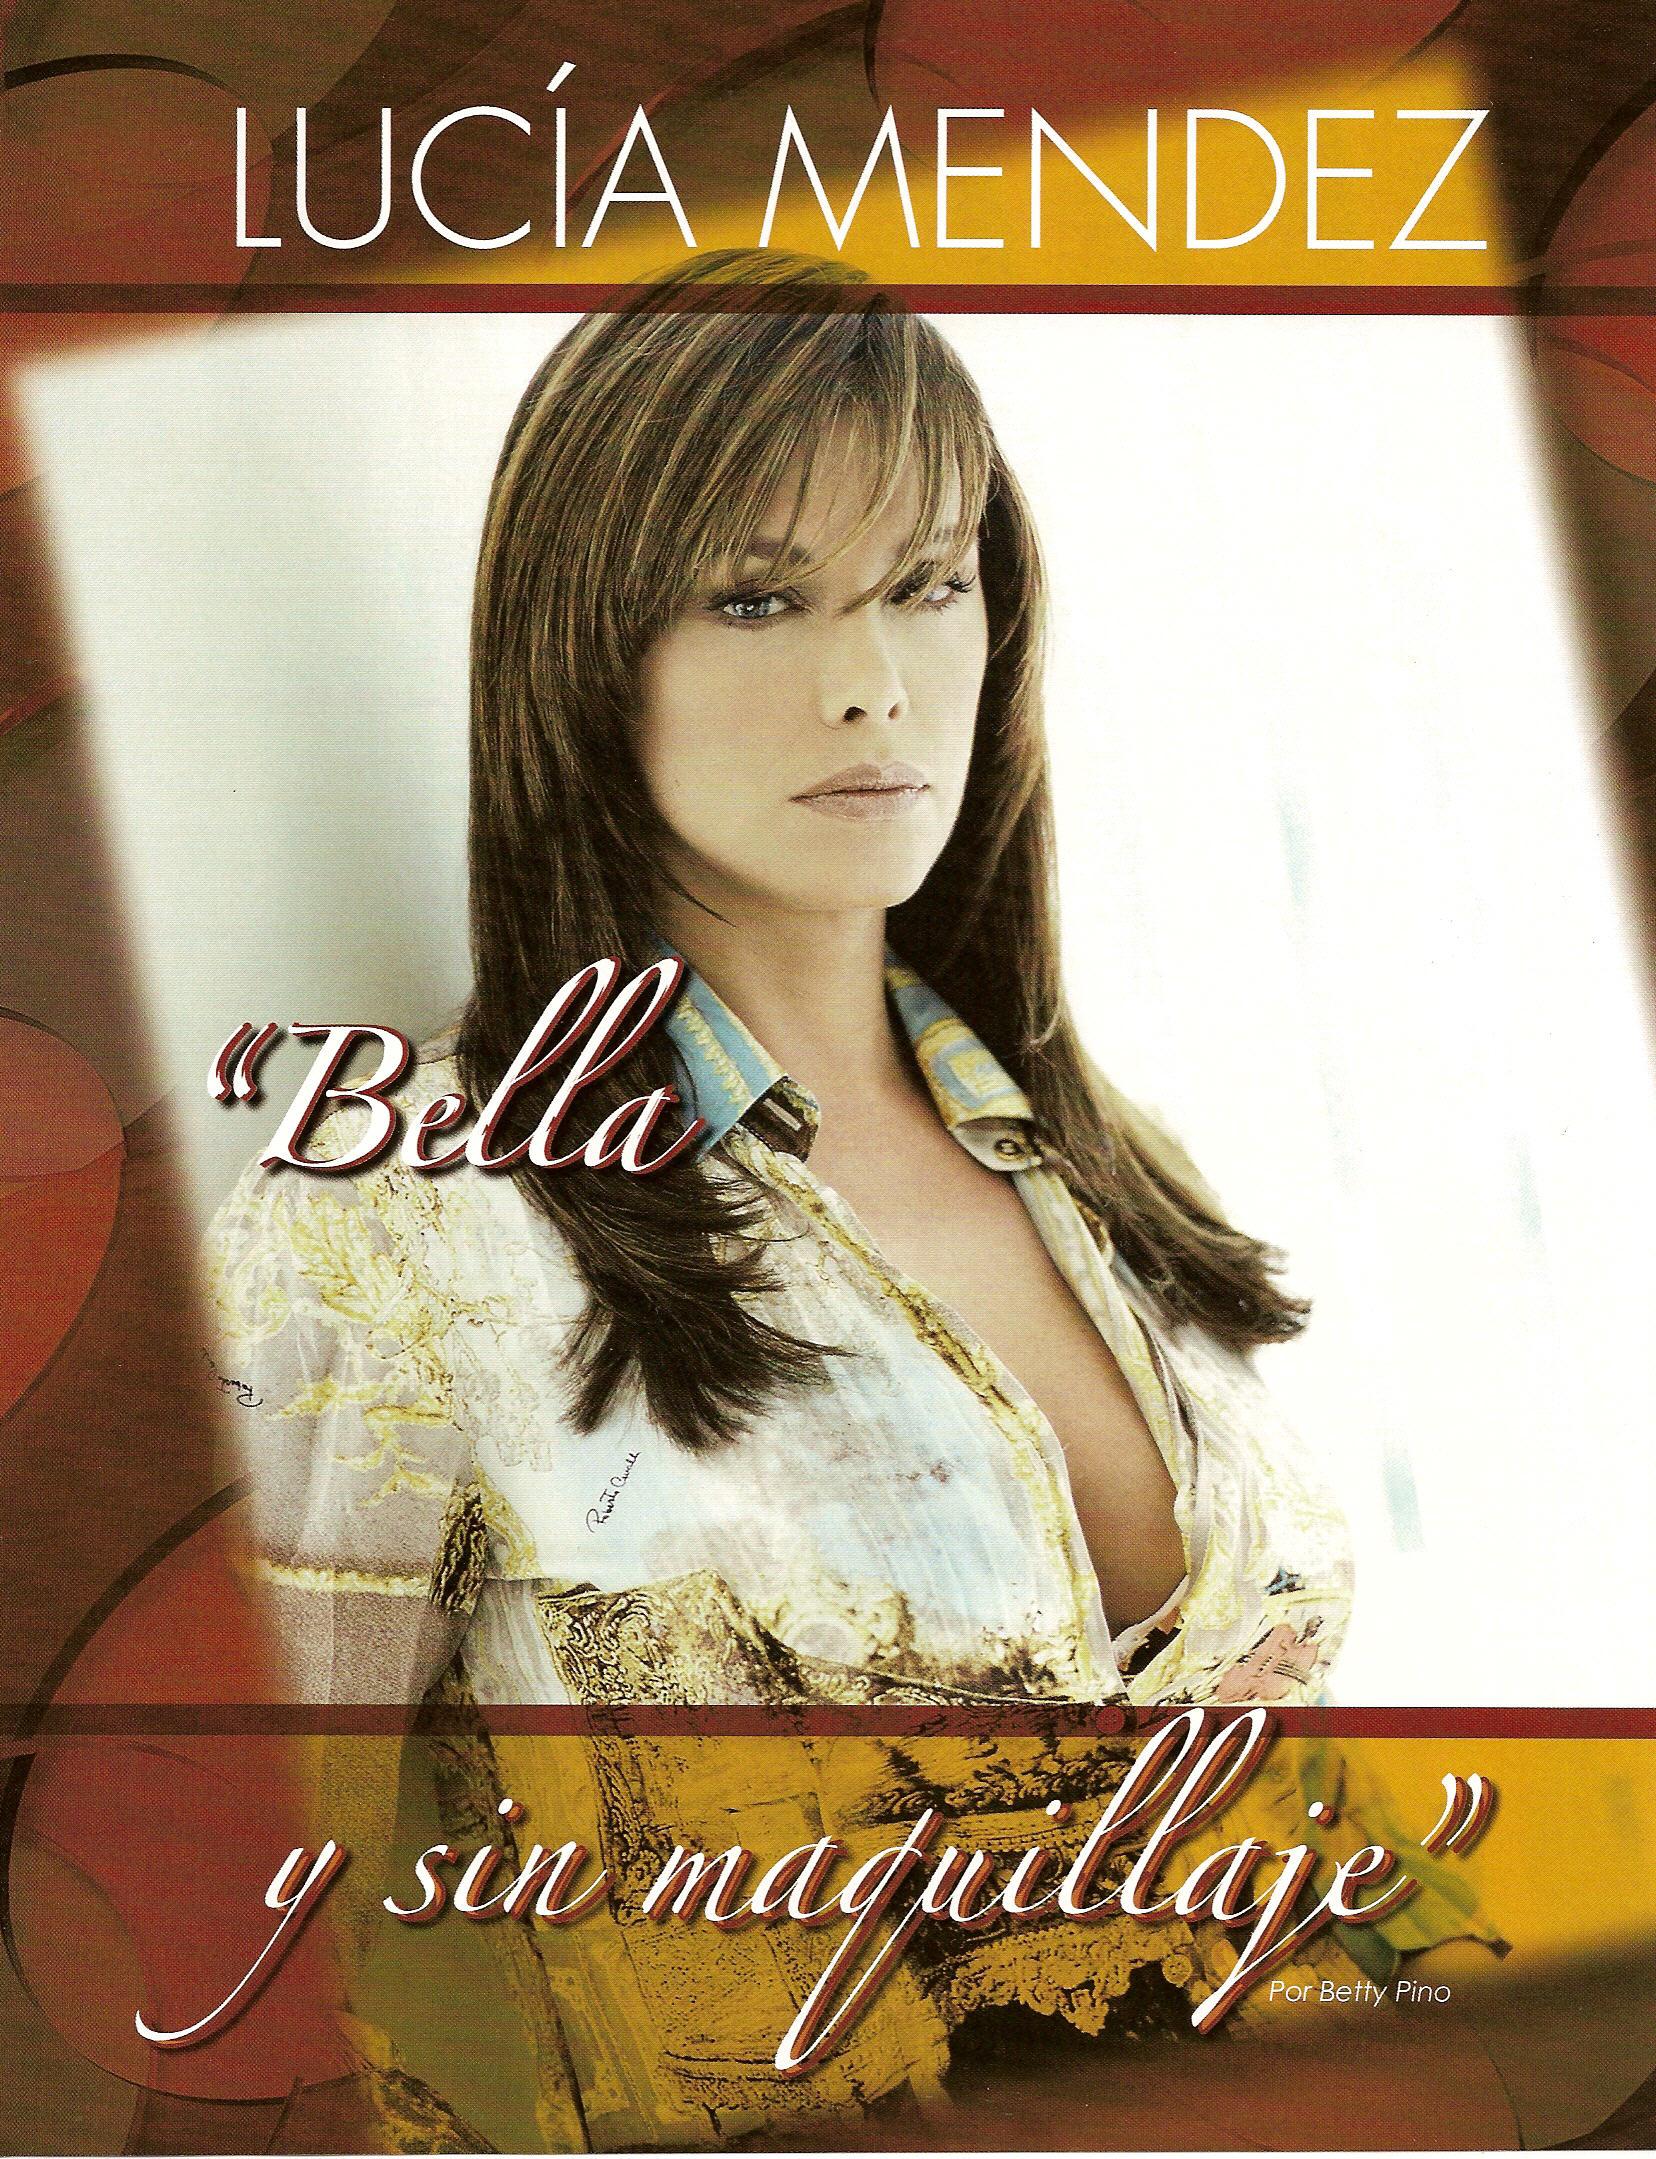 Лусия Мендес/Lucia Mendez  - Страница 32 87421db6d797